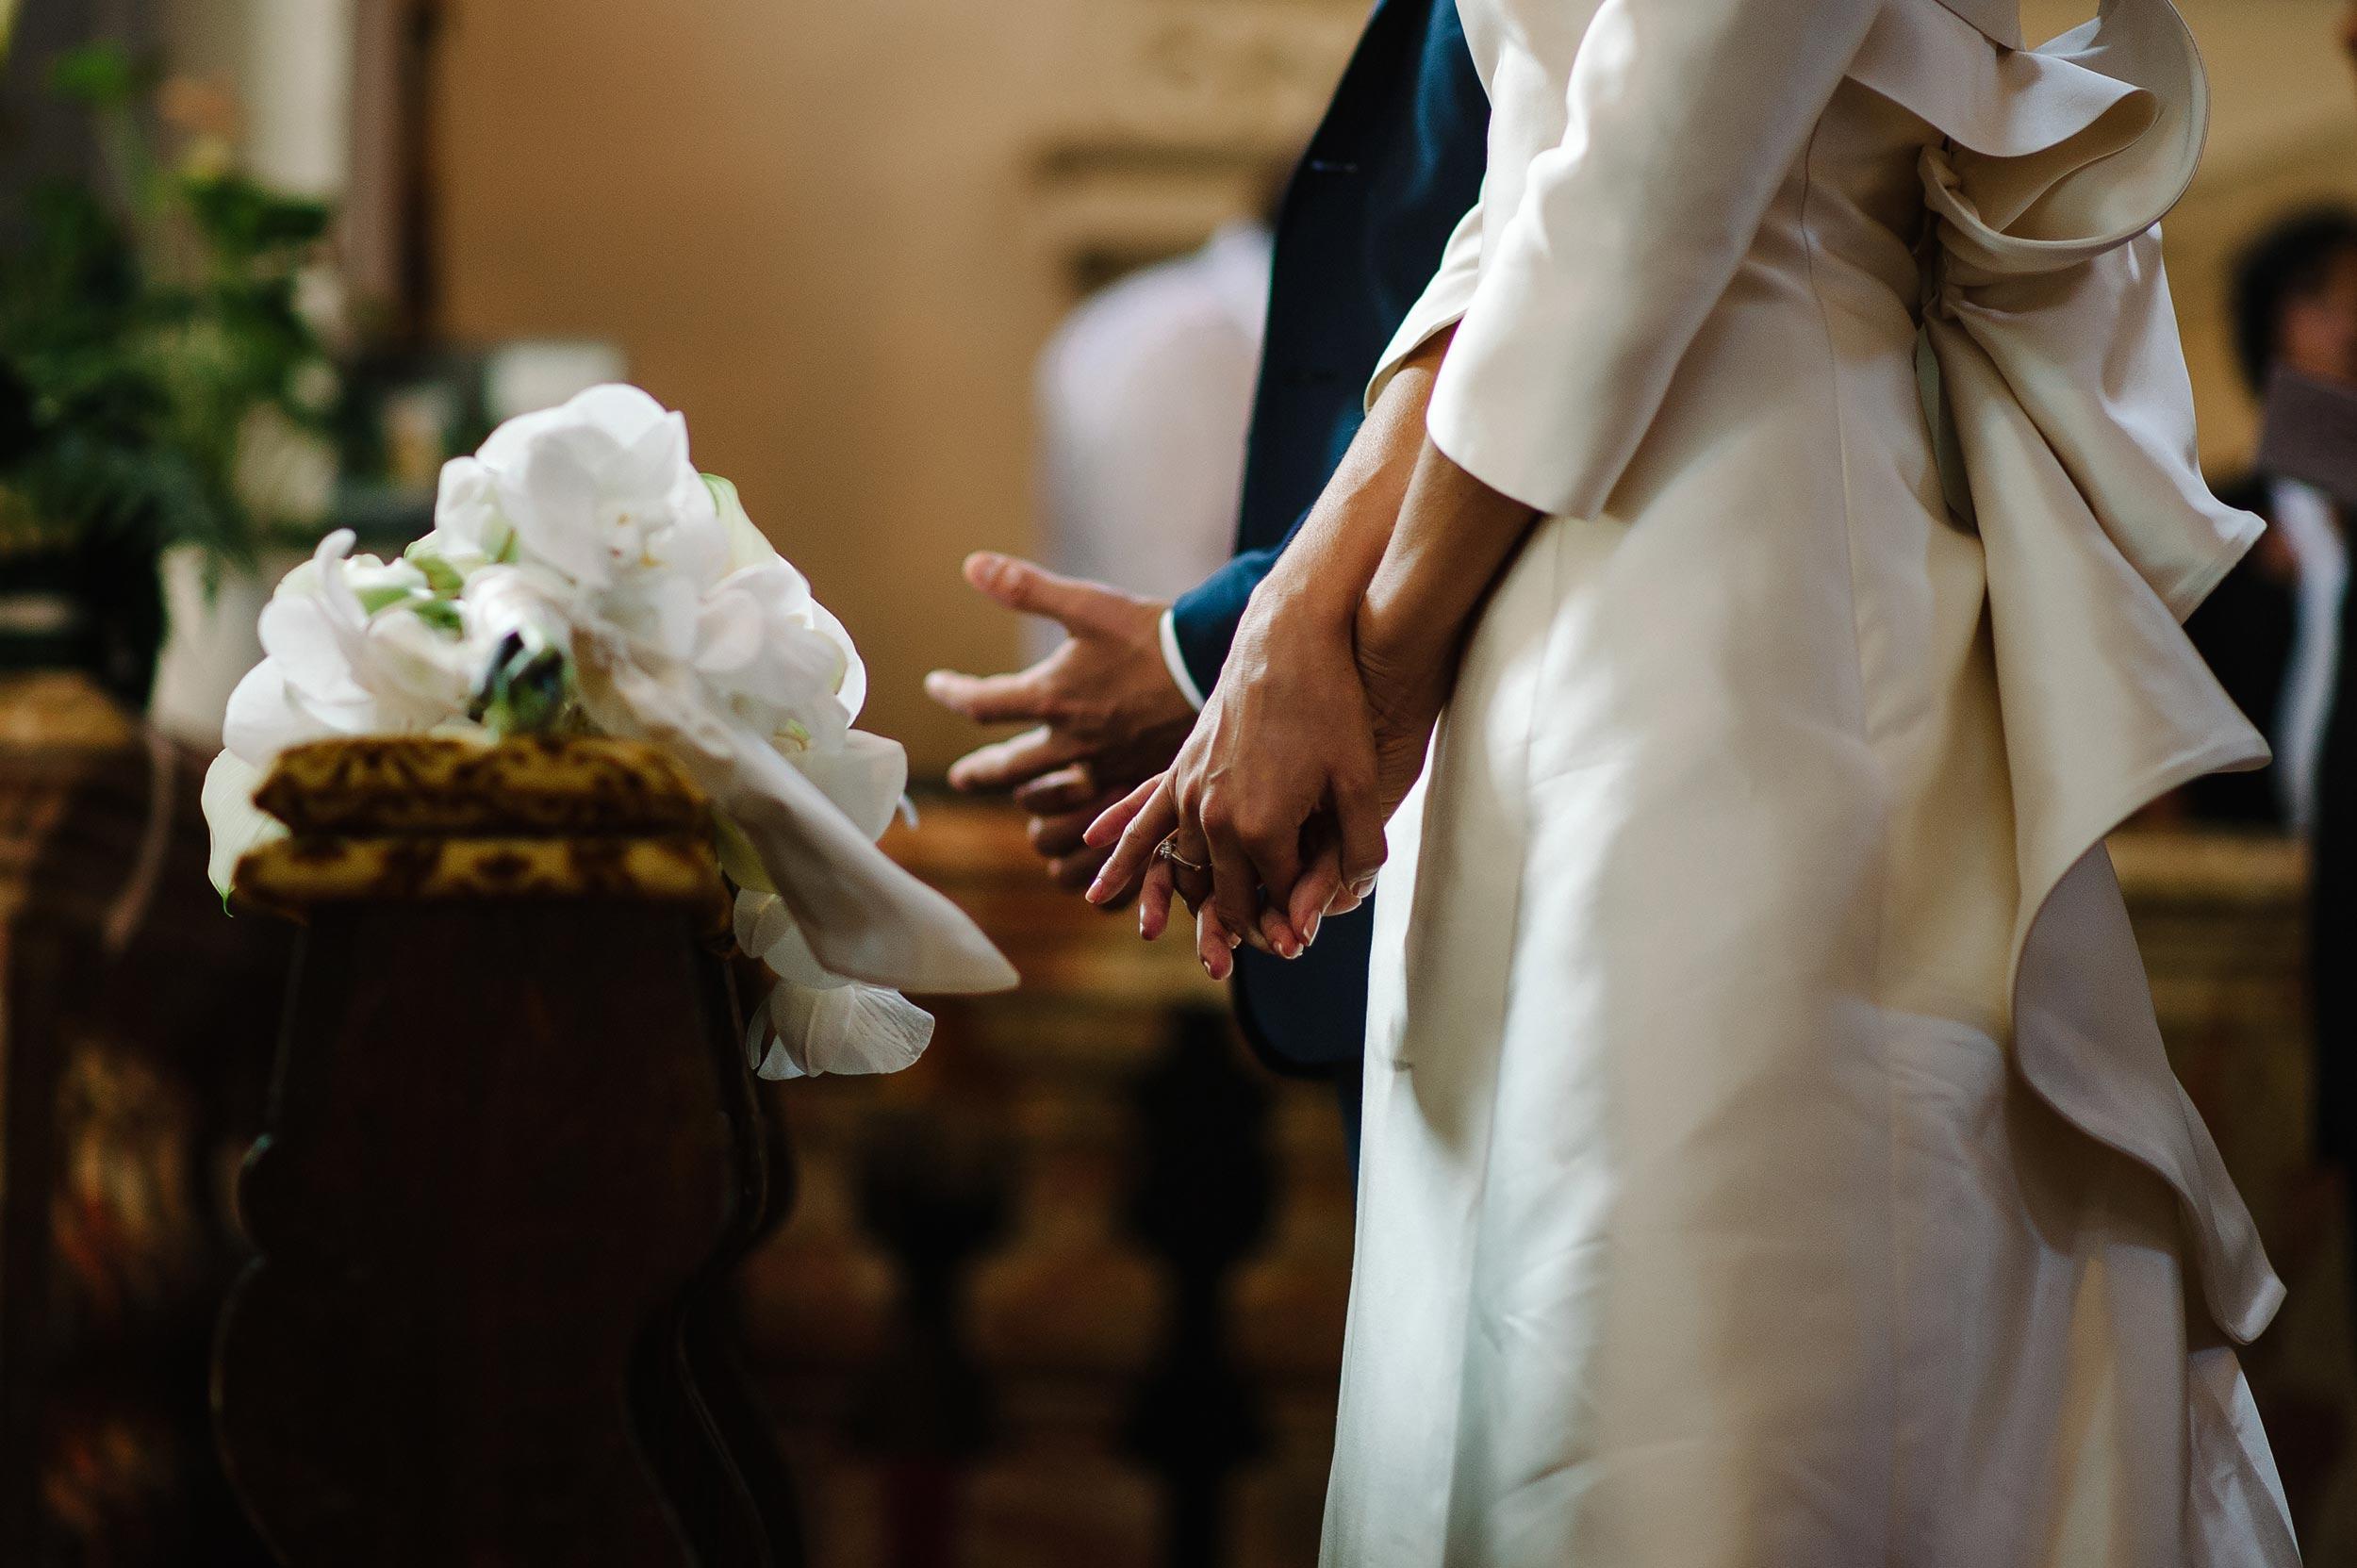 bride-and-groom-hands-touching-their-rings-after-rings-exchange-lugano-switzerlang.jpg